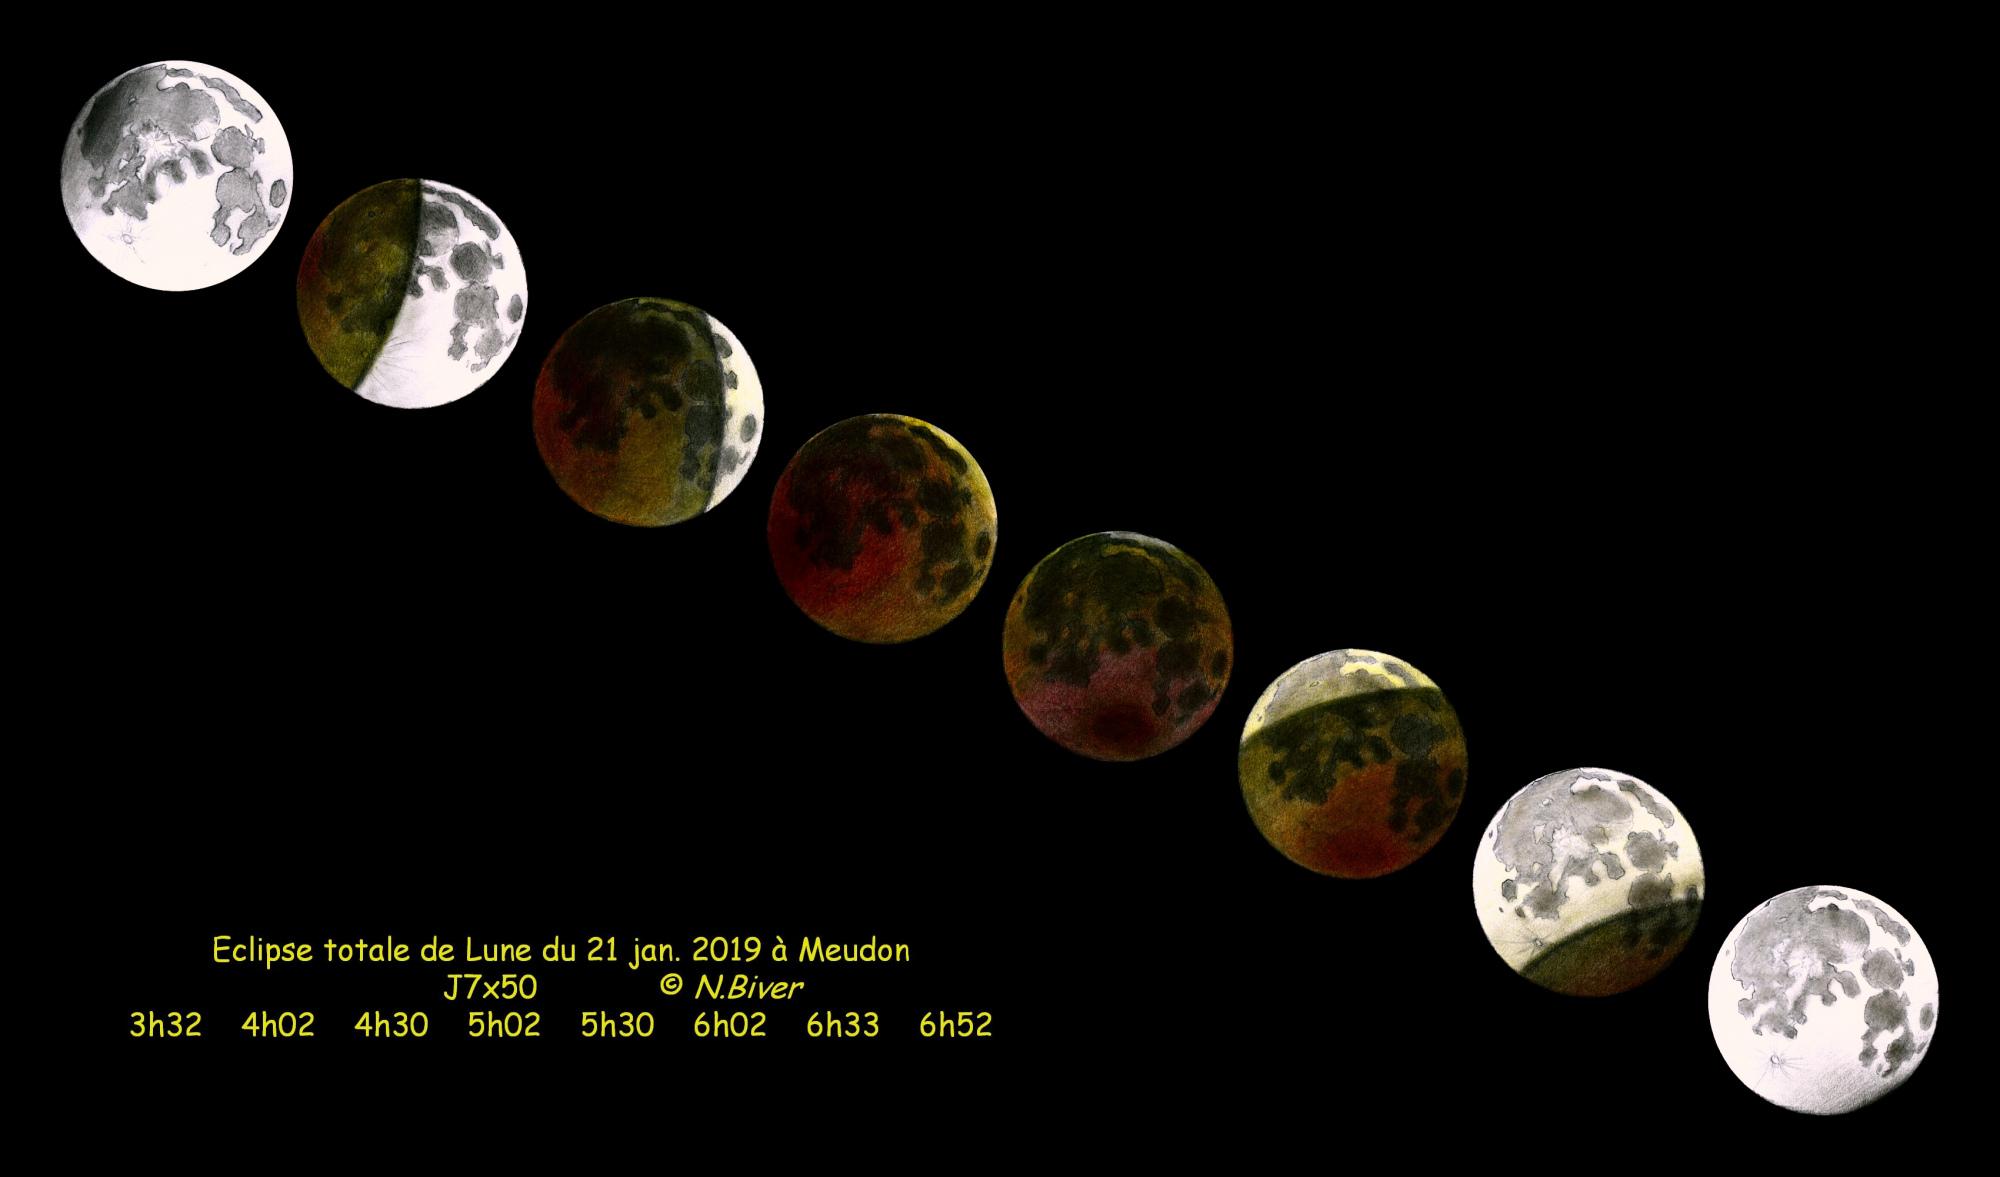 eclipse-lune210119-3h32-6h52-j7x50curvleg.thumb.jpg.c88a645aee4b21fc7b4e2ba8b6e82b01.jpg